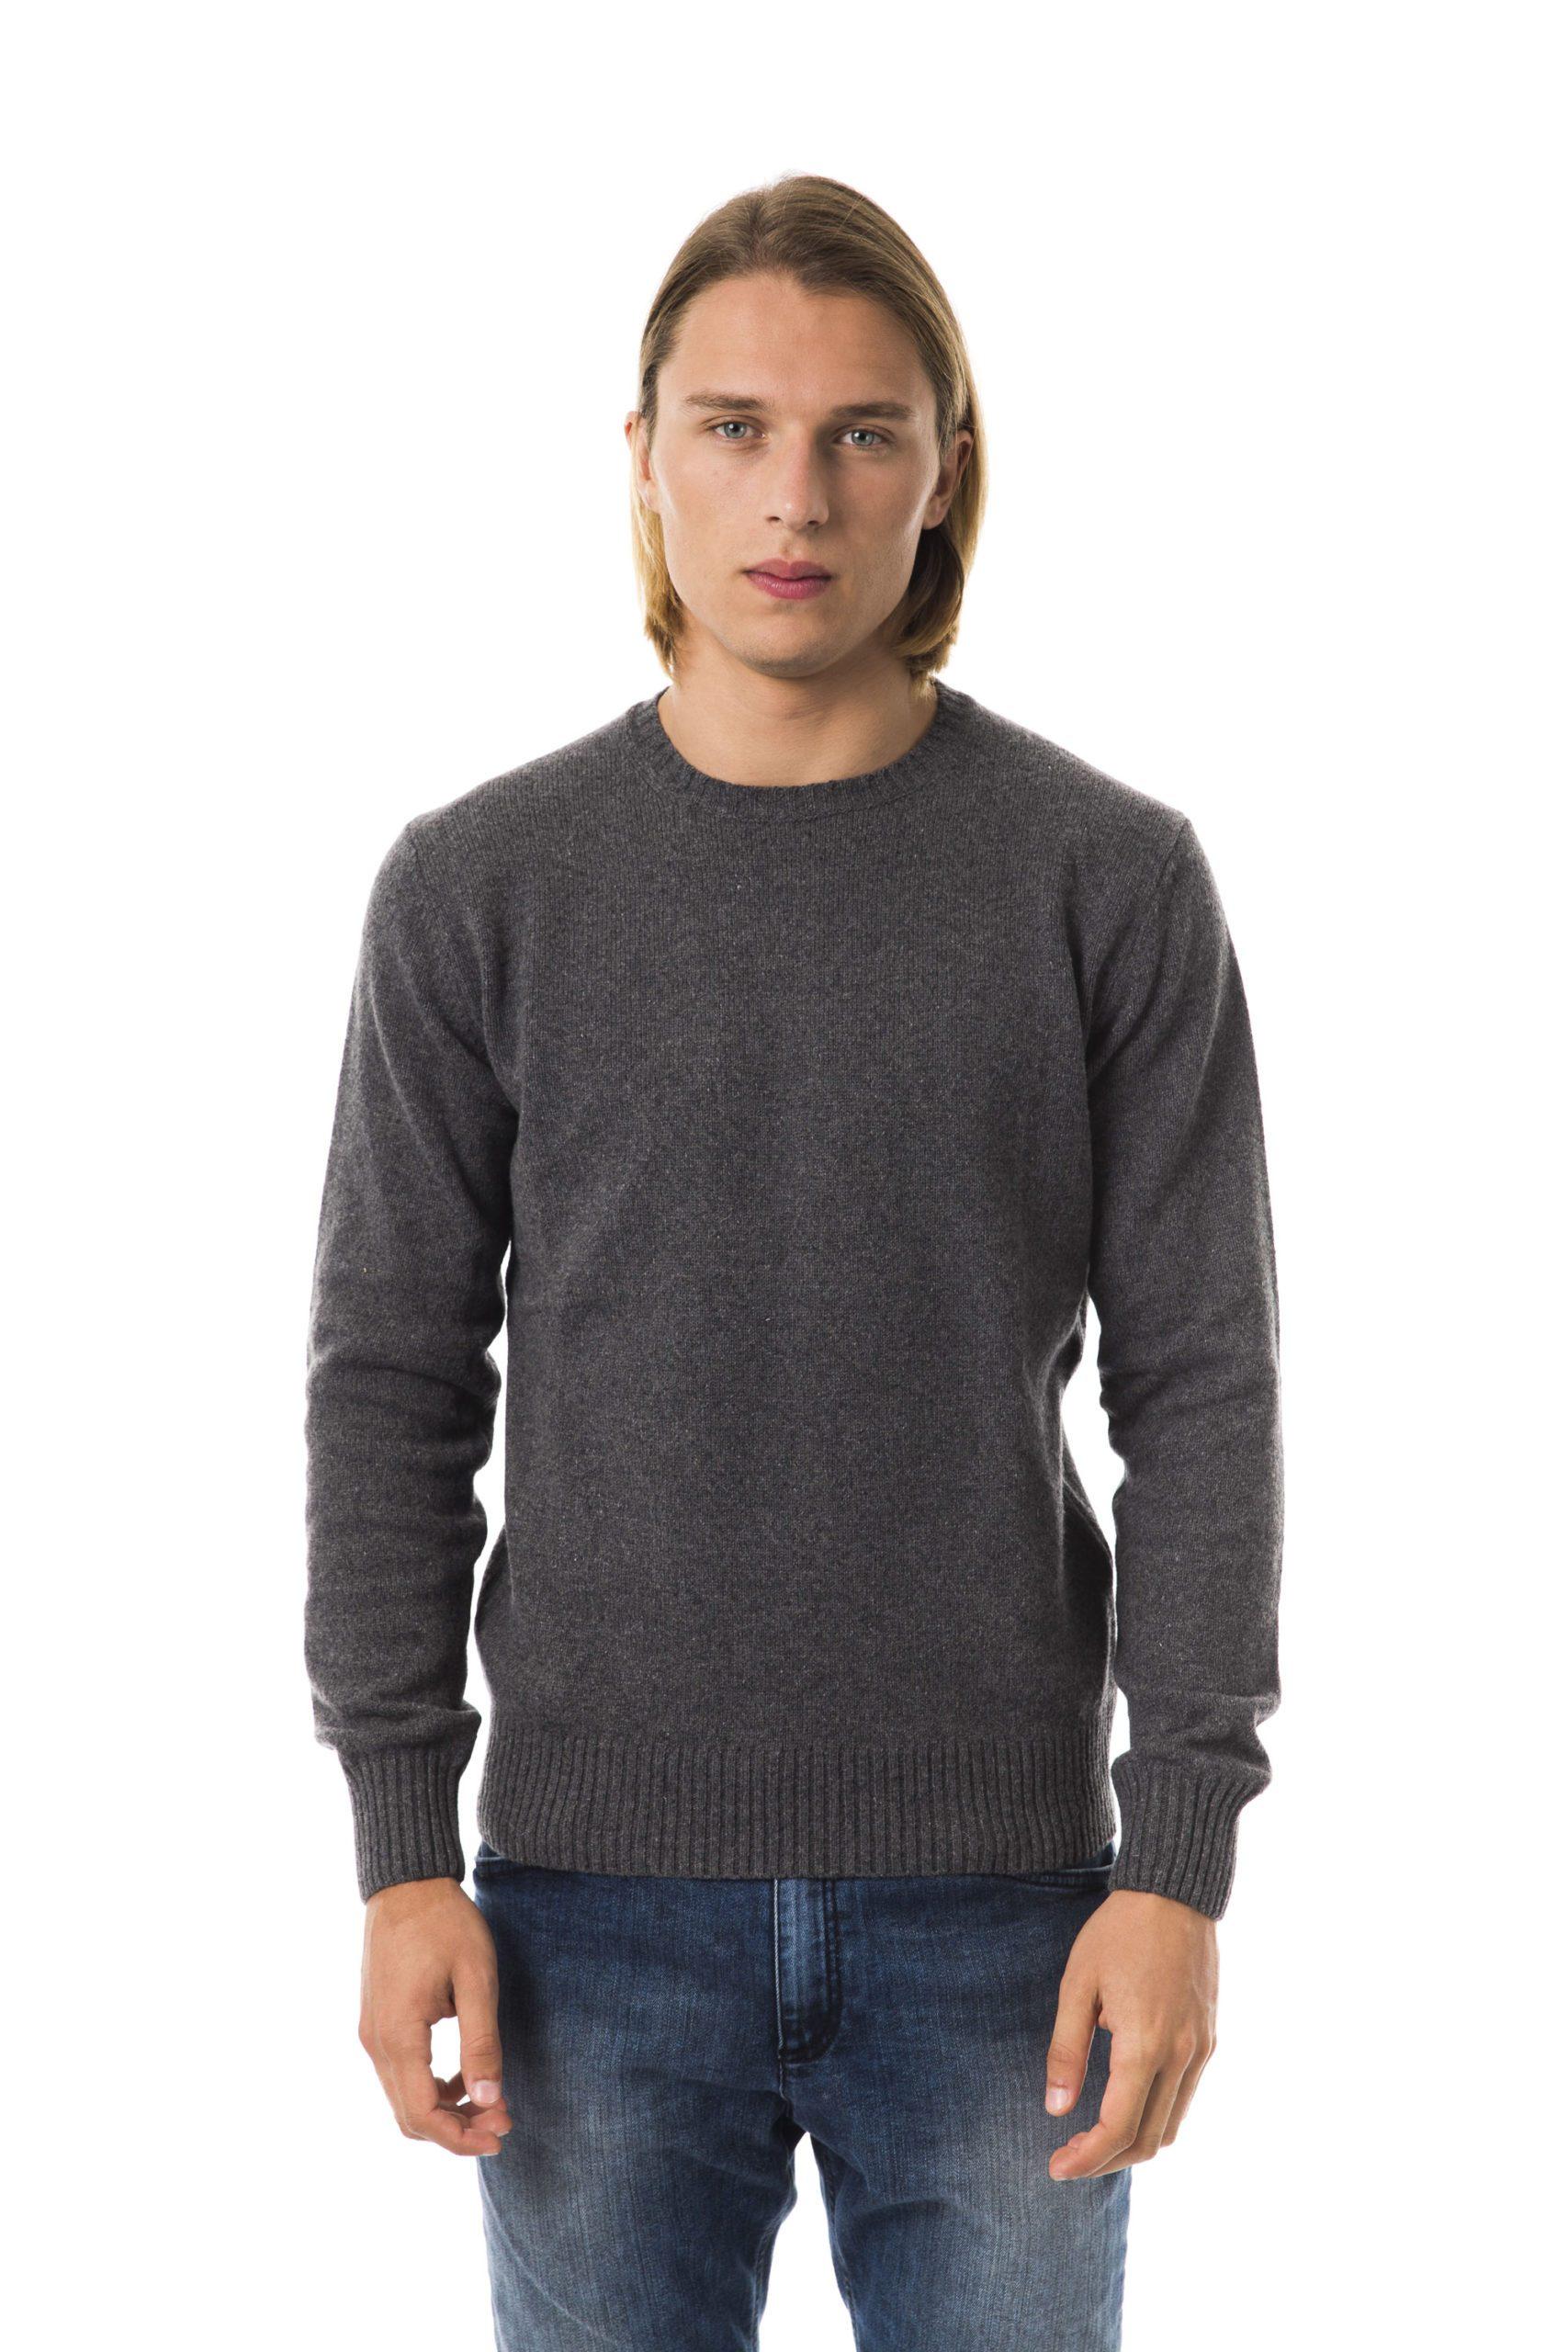 Uominitaliani Men's G R I S C. Sweater Gray UO816436 - L